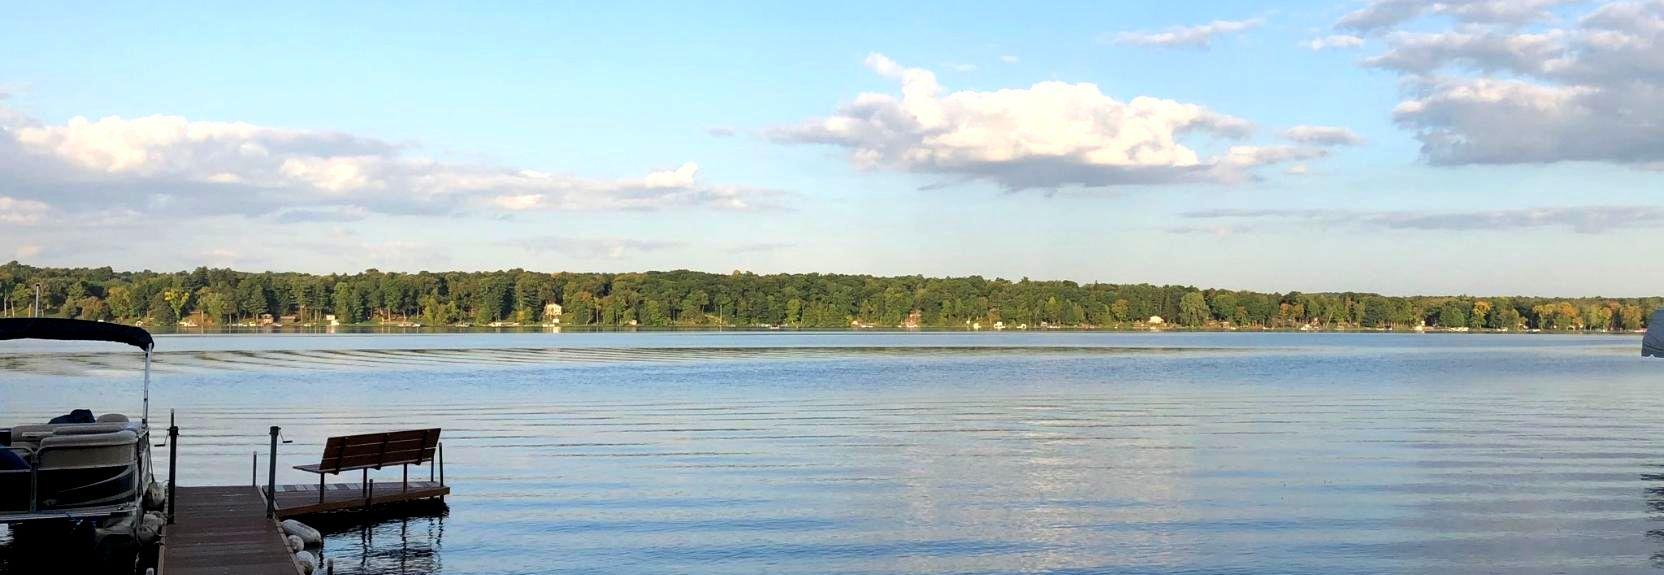 Interstate State Park, Taylors Falls, Minnesota, United States of America